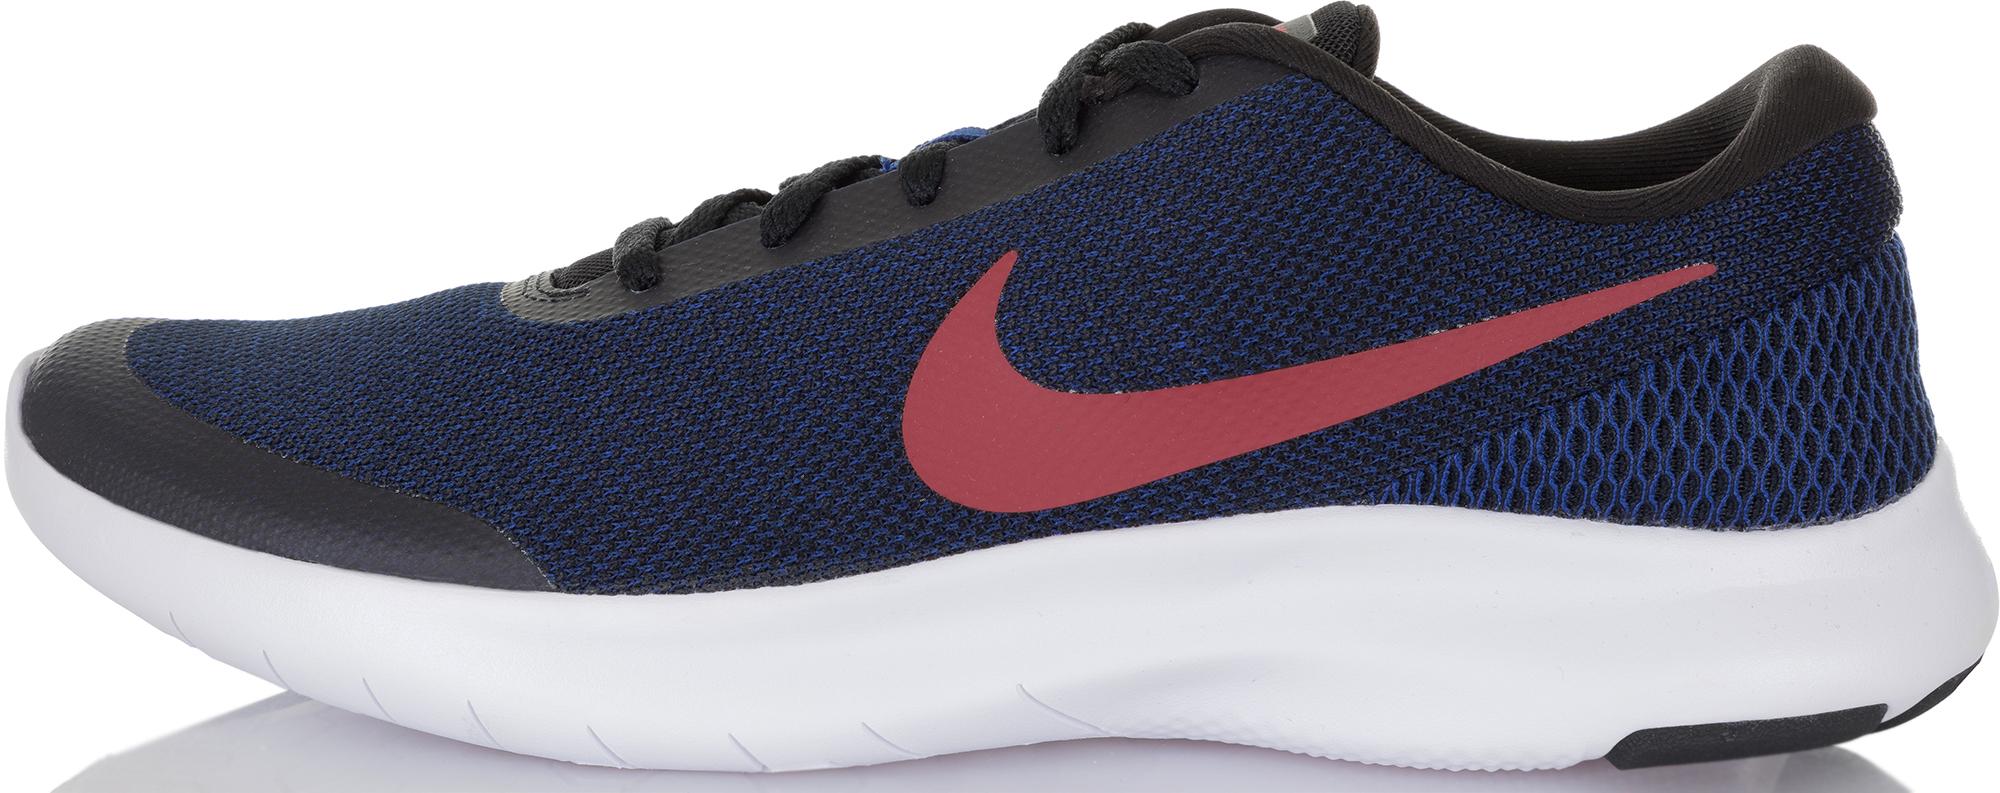 Nike Кроссовки мужские Nike Flex Experience RN 7, размер 43